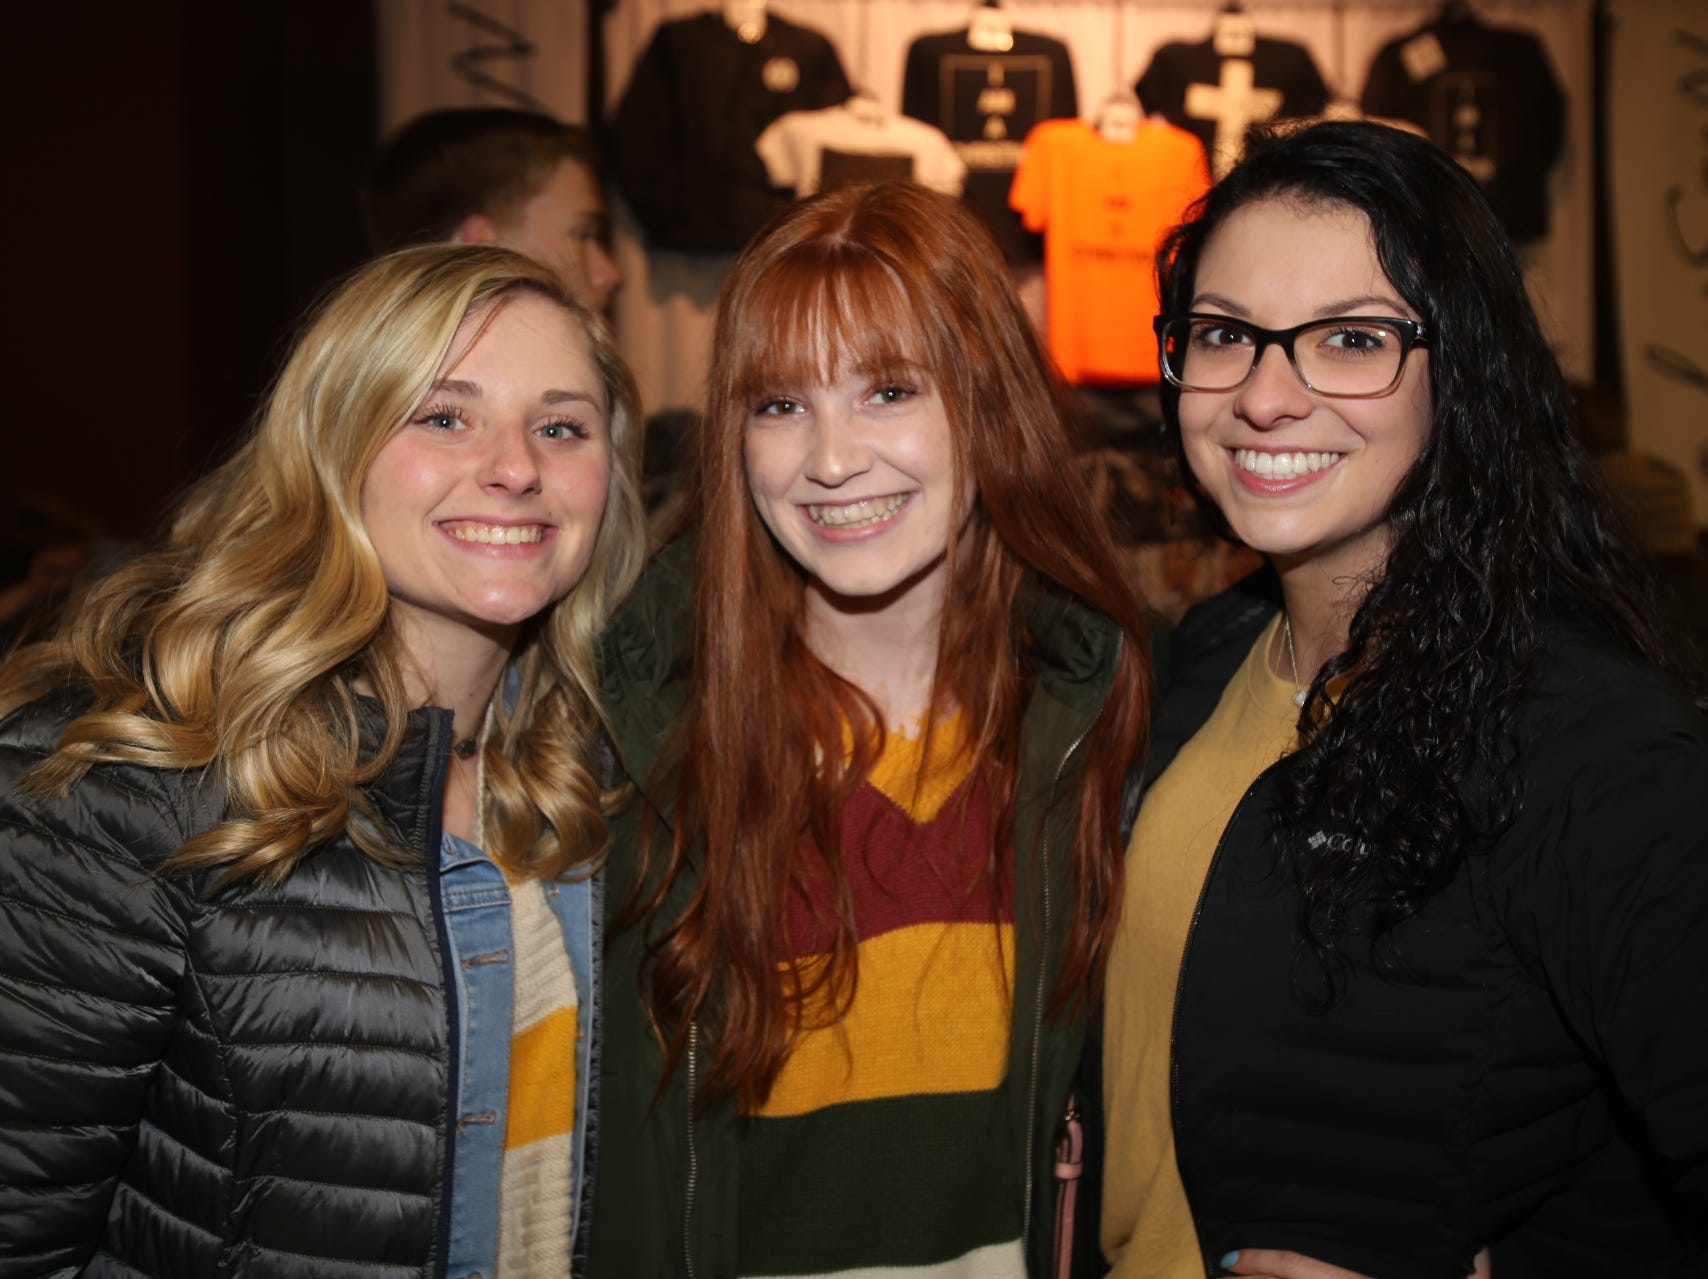 Dominique Schultz, Maggie Wampler, and Mariah Vazquez